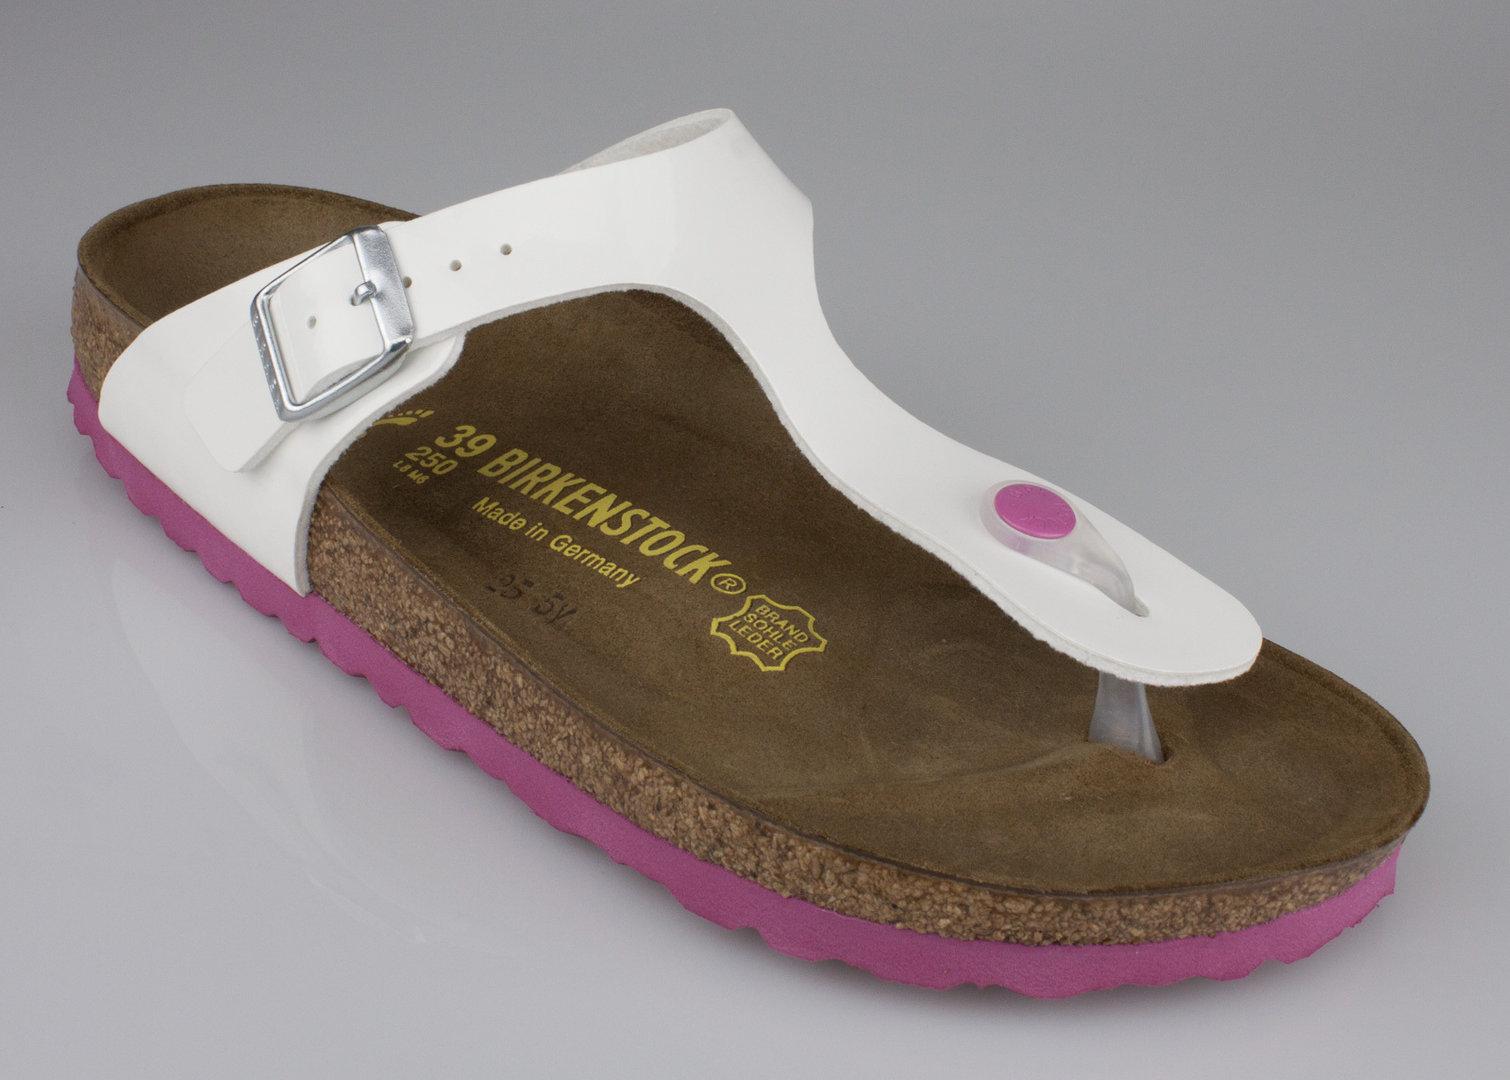 41444a87525d59 Birkenstock 0345083 GIZEH narrow slippers Birko-Flor lack white-pink